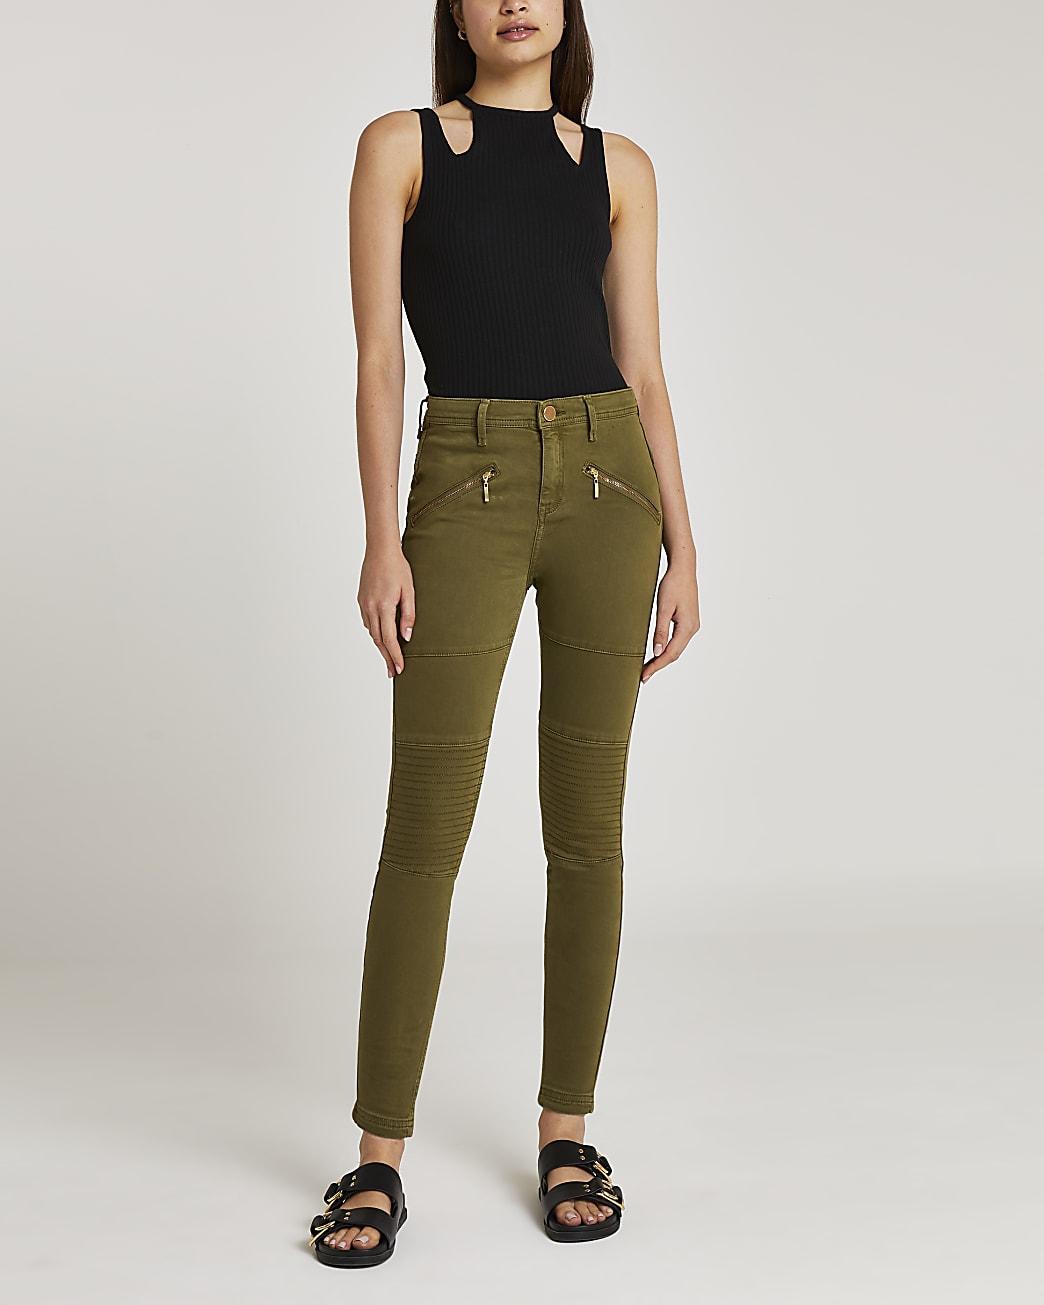 Khaki mid rise bum sculpt skinny jeans